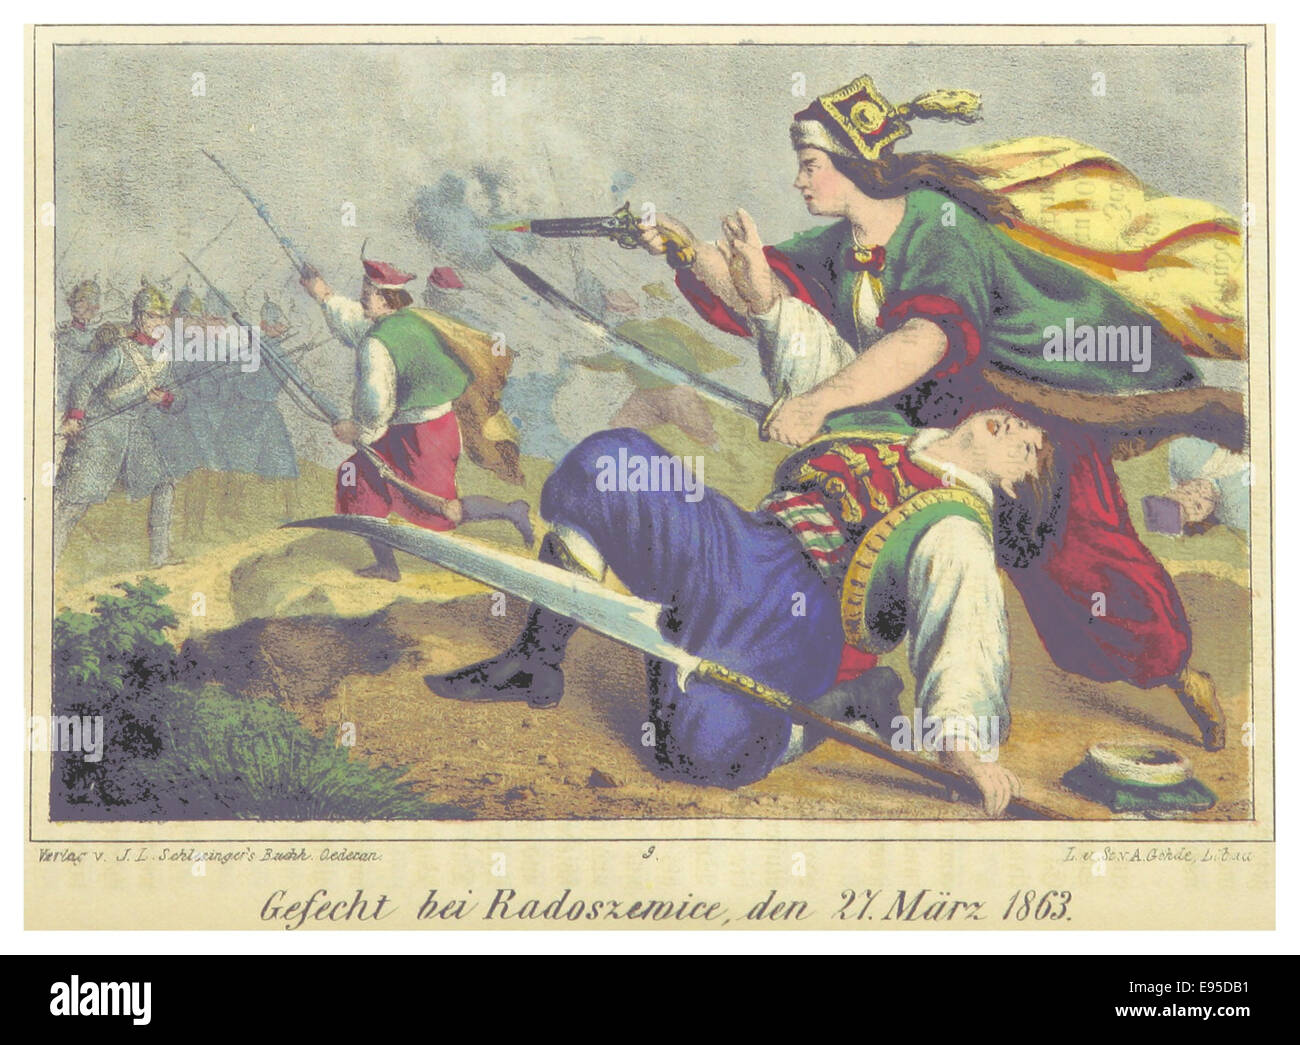 J.(1864) Poln.Rev. p320 GEFECHT BEI RADOSZEWICE, DEN 27. MC384RZ 1863 - Stock Image